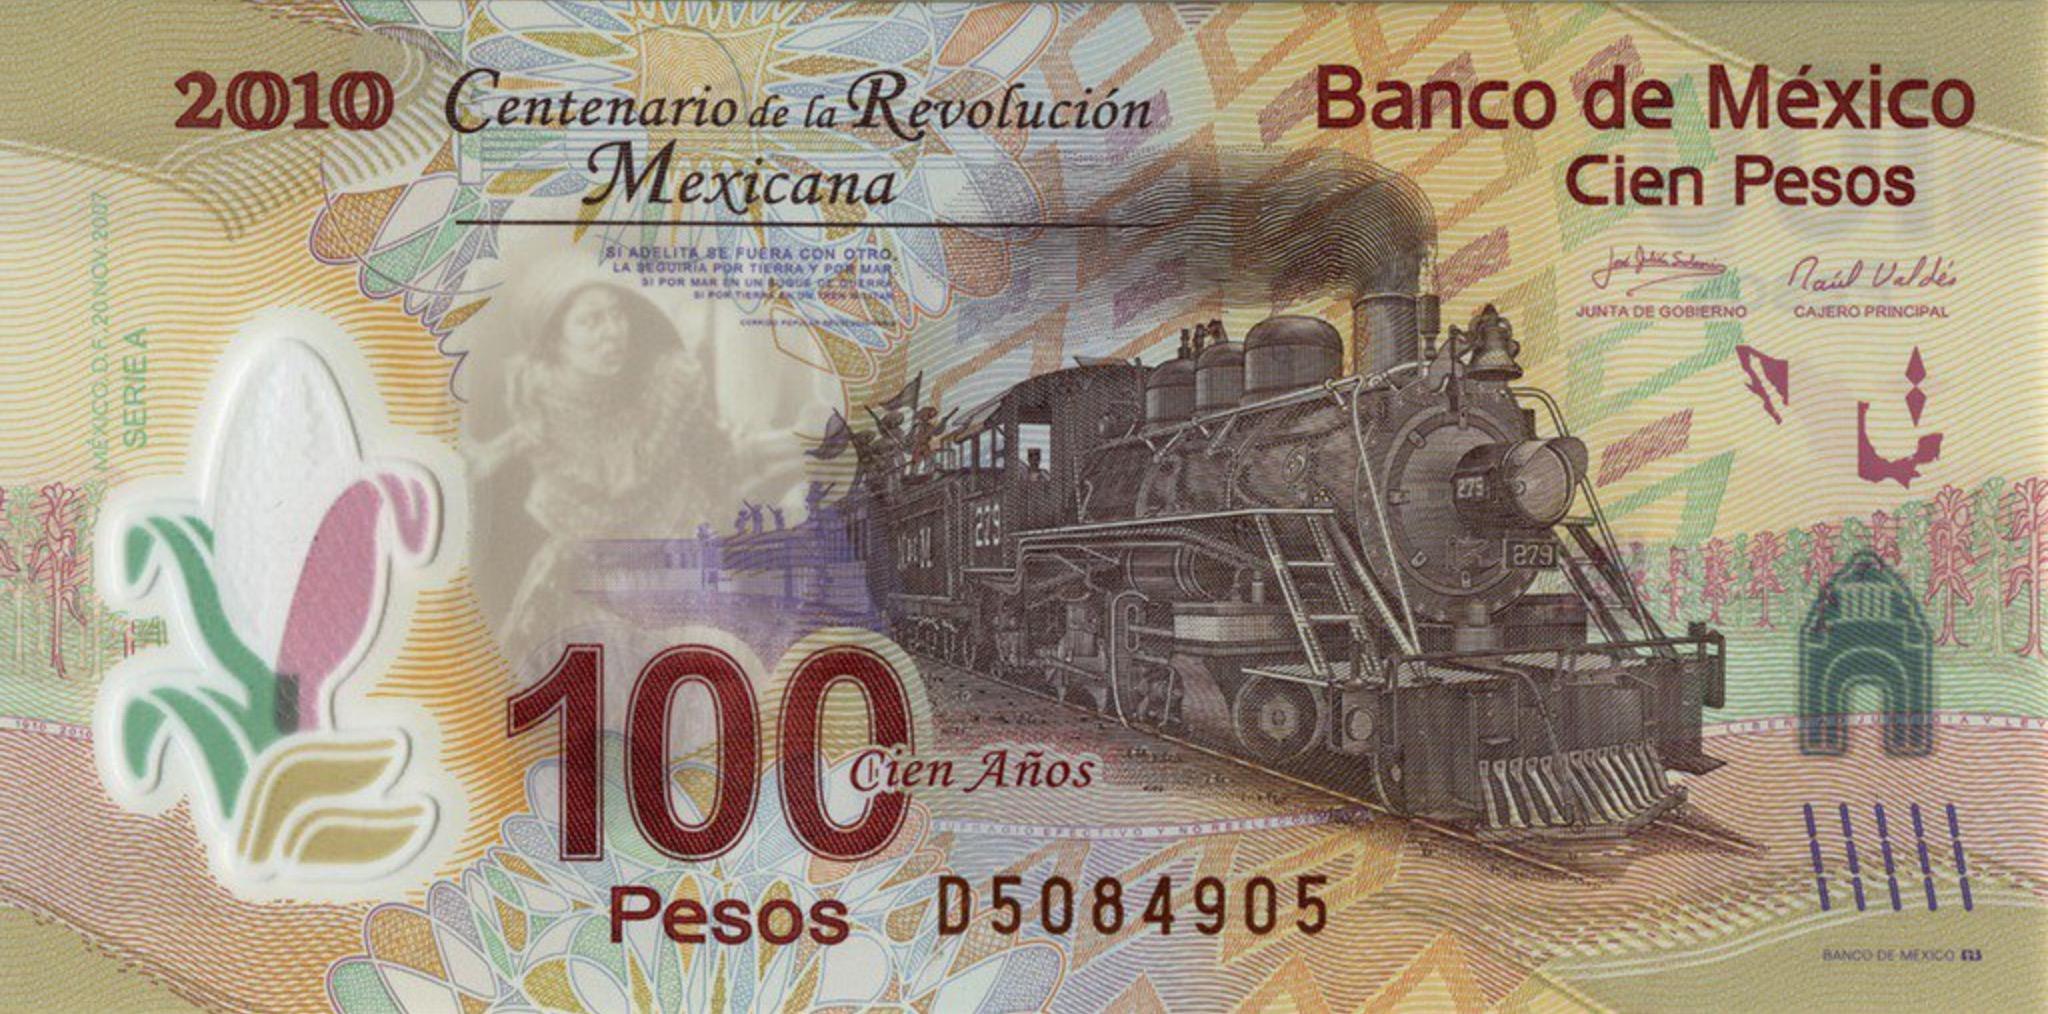 100 Mexican Pesos commemorative banknote Mexican Revolution